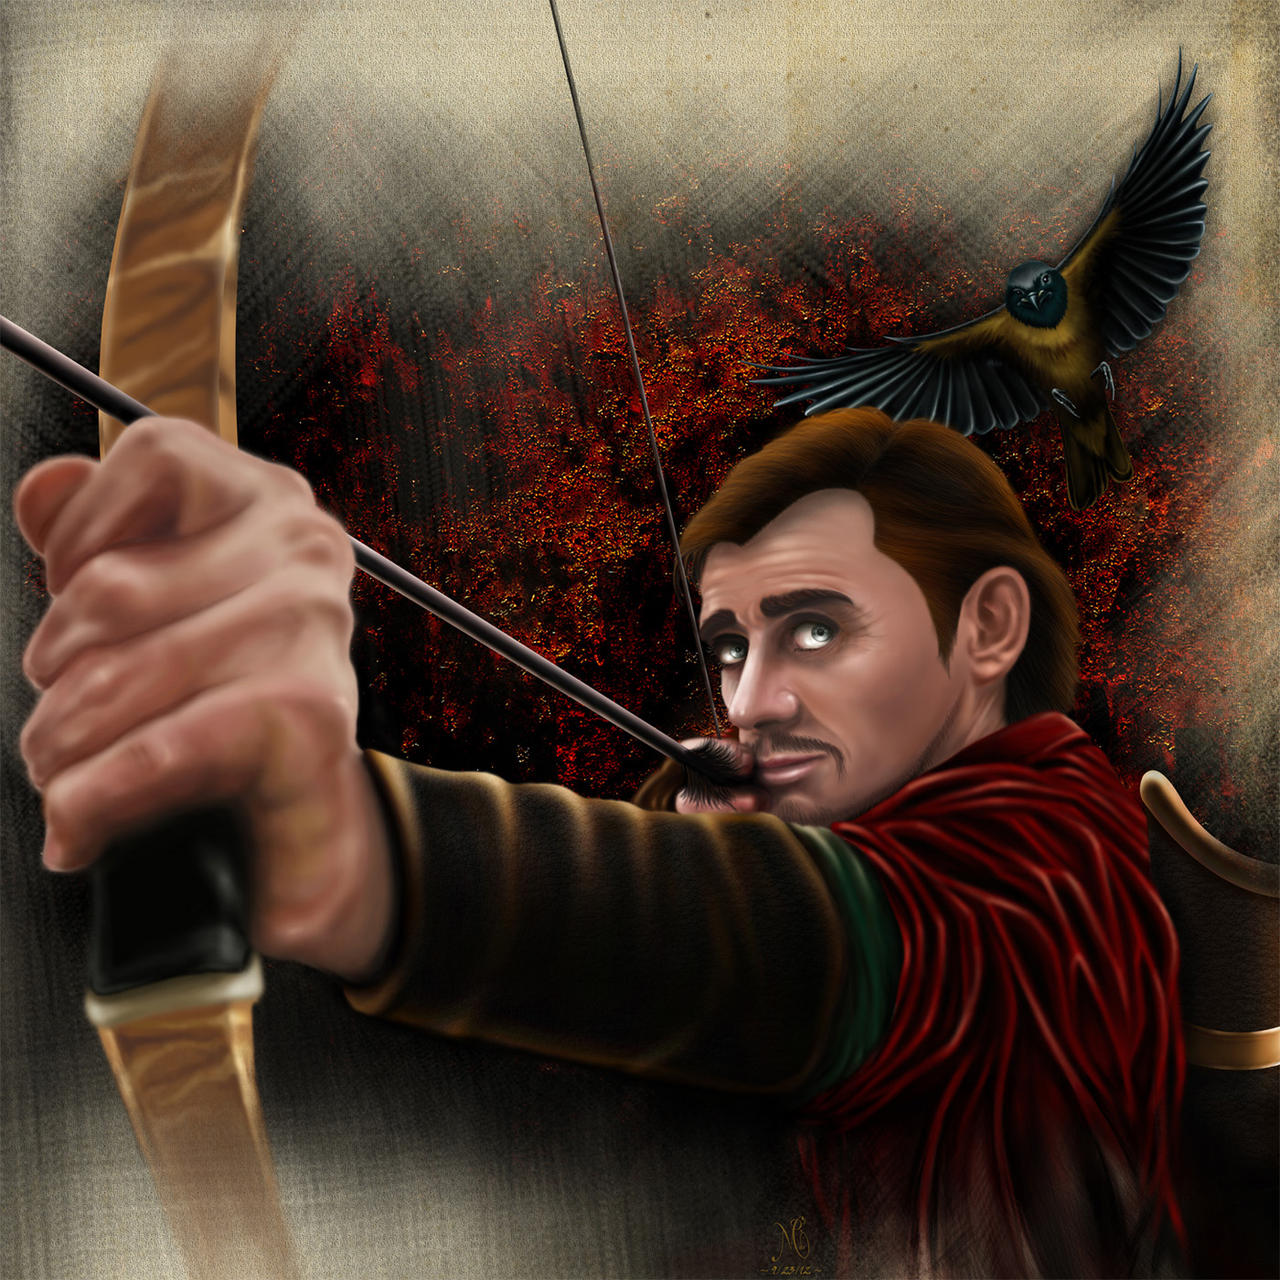 Bard the bowman art